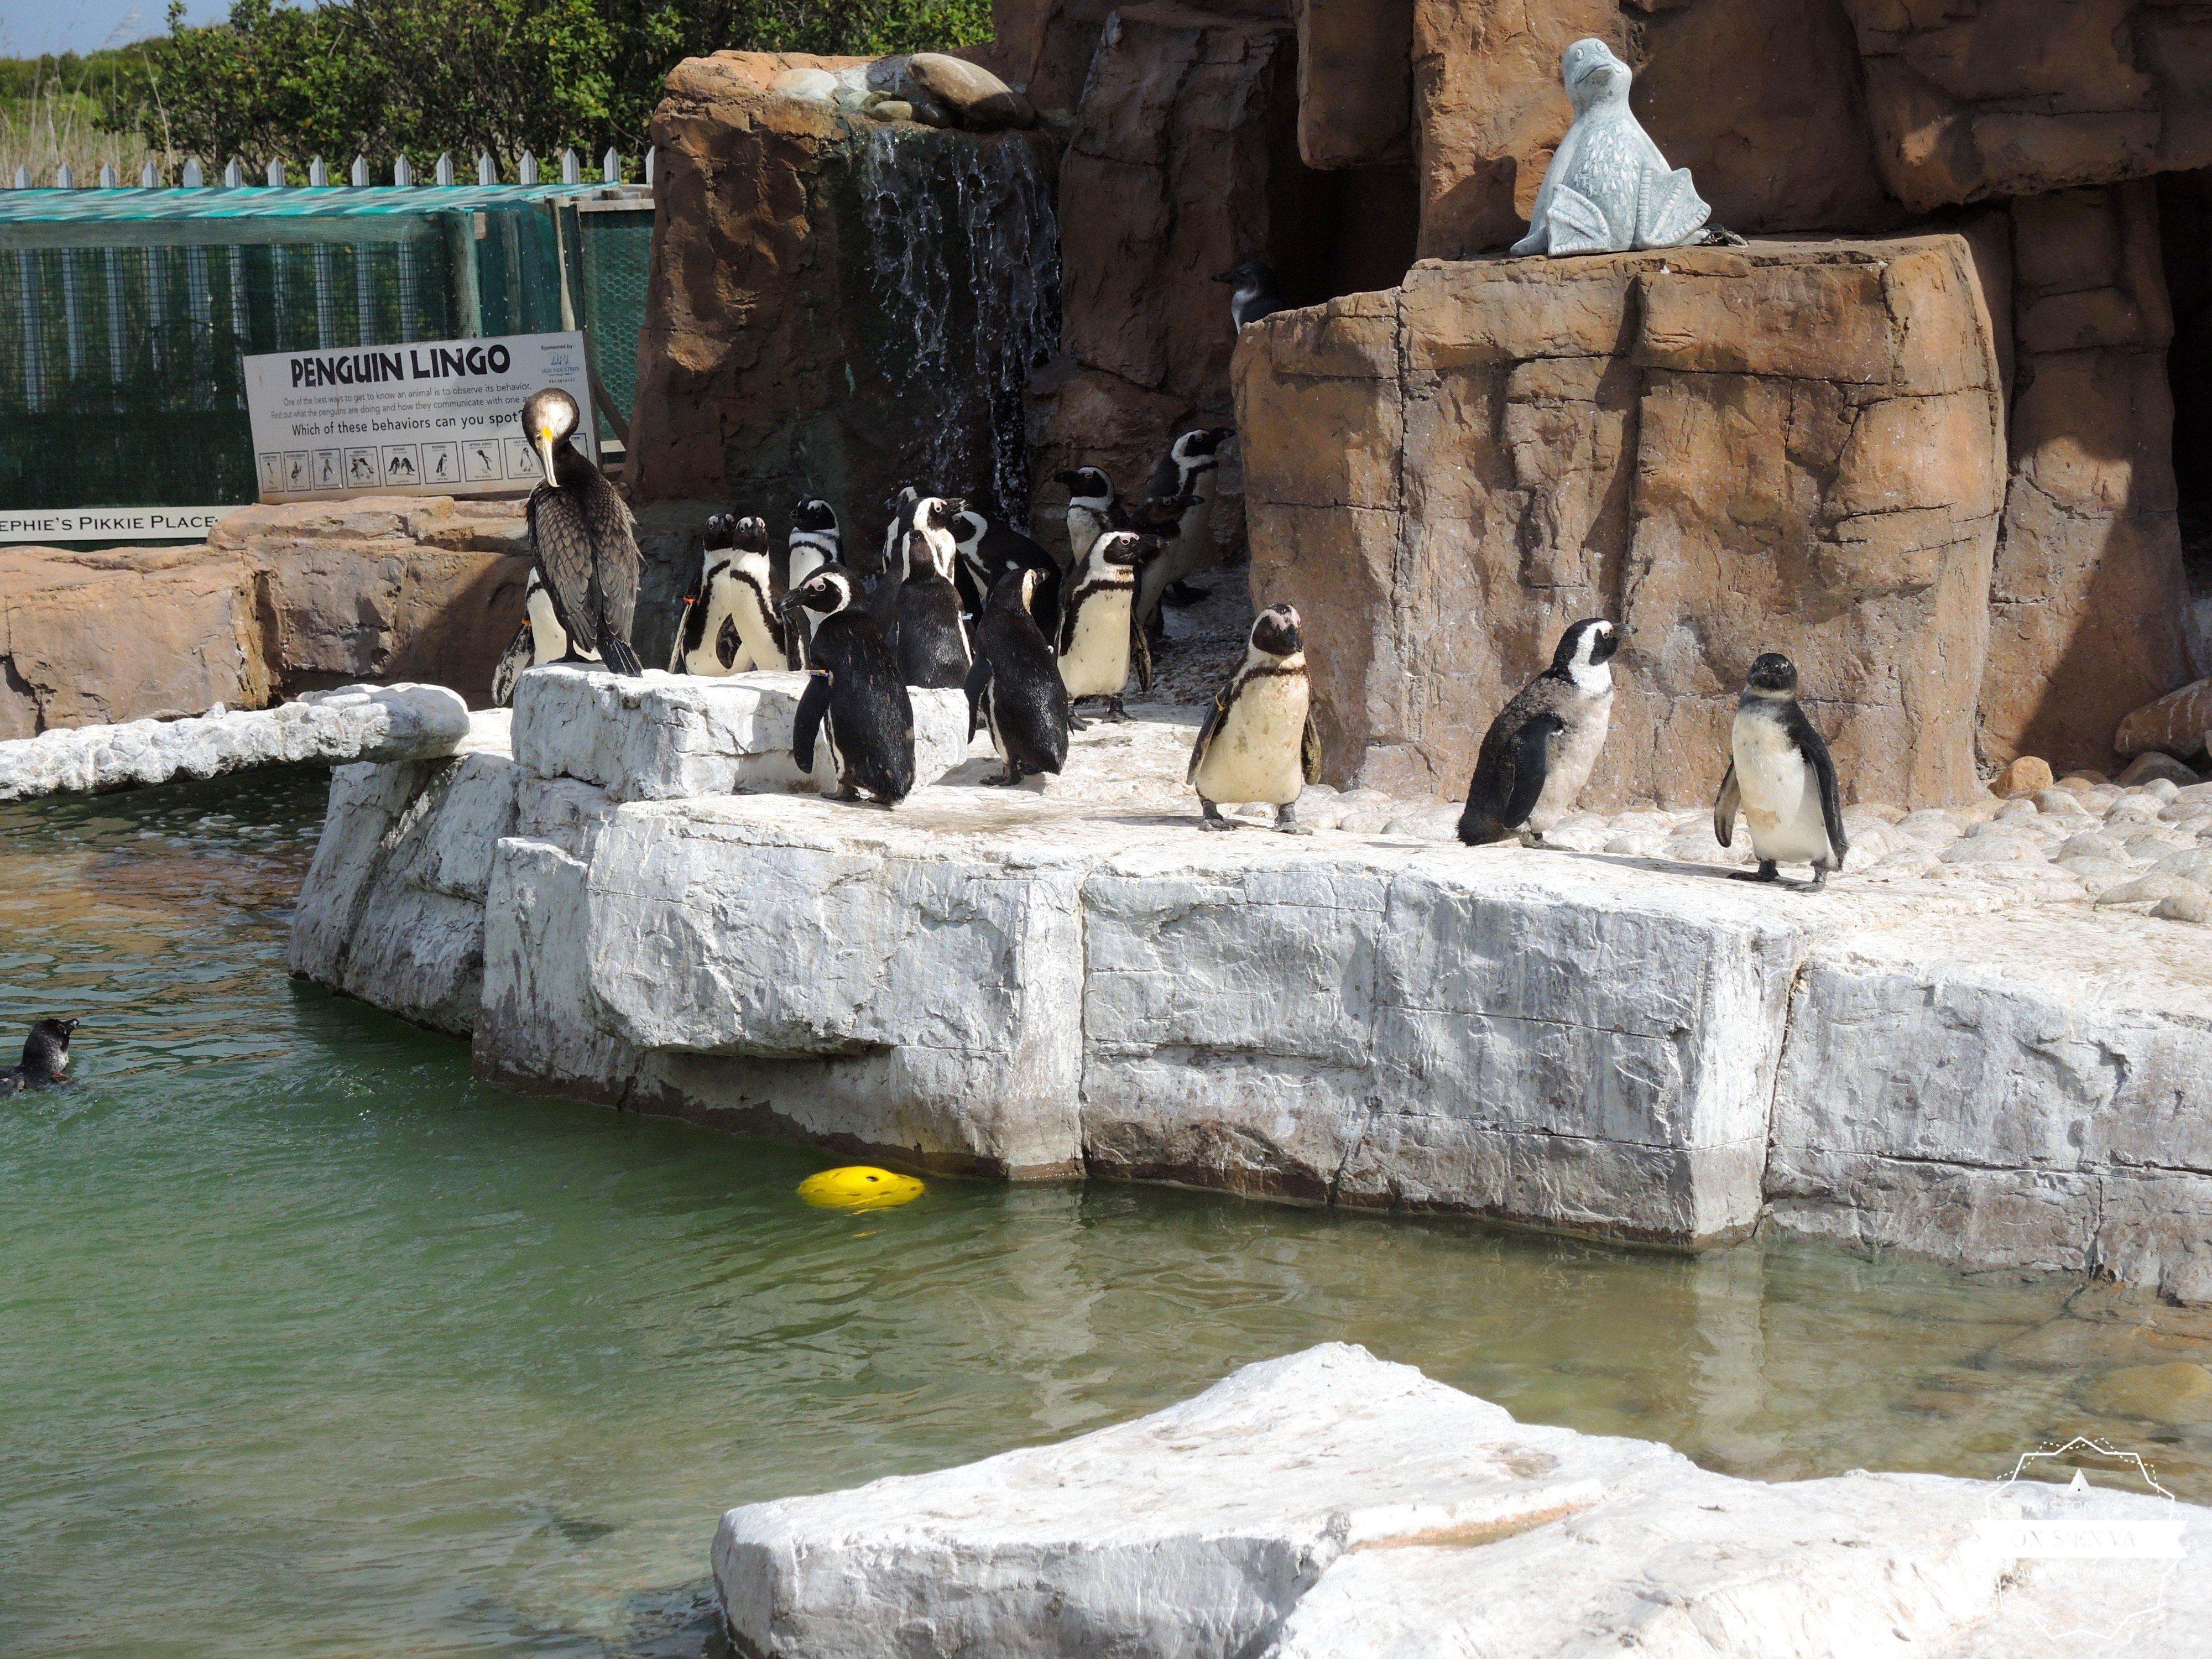 Les pingouins soignés à SAMREC